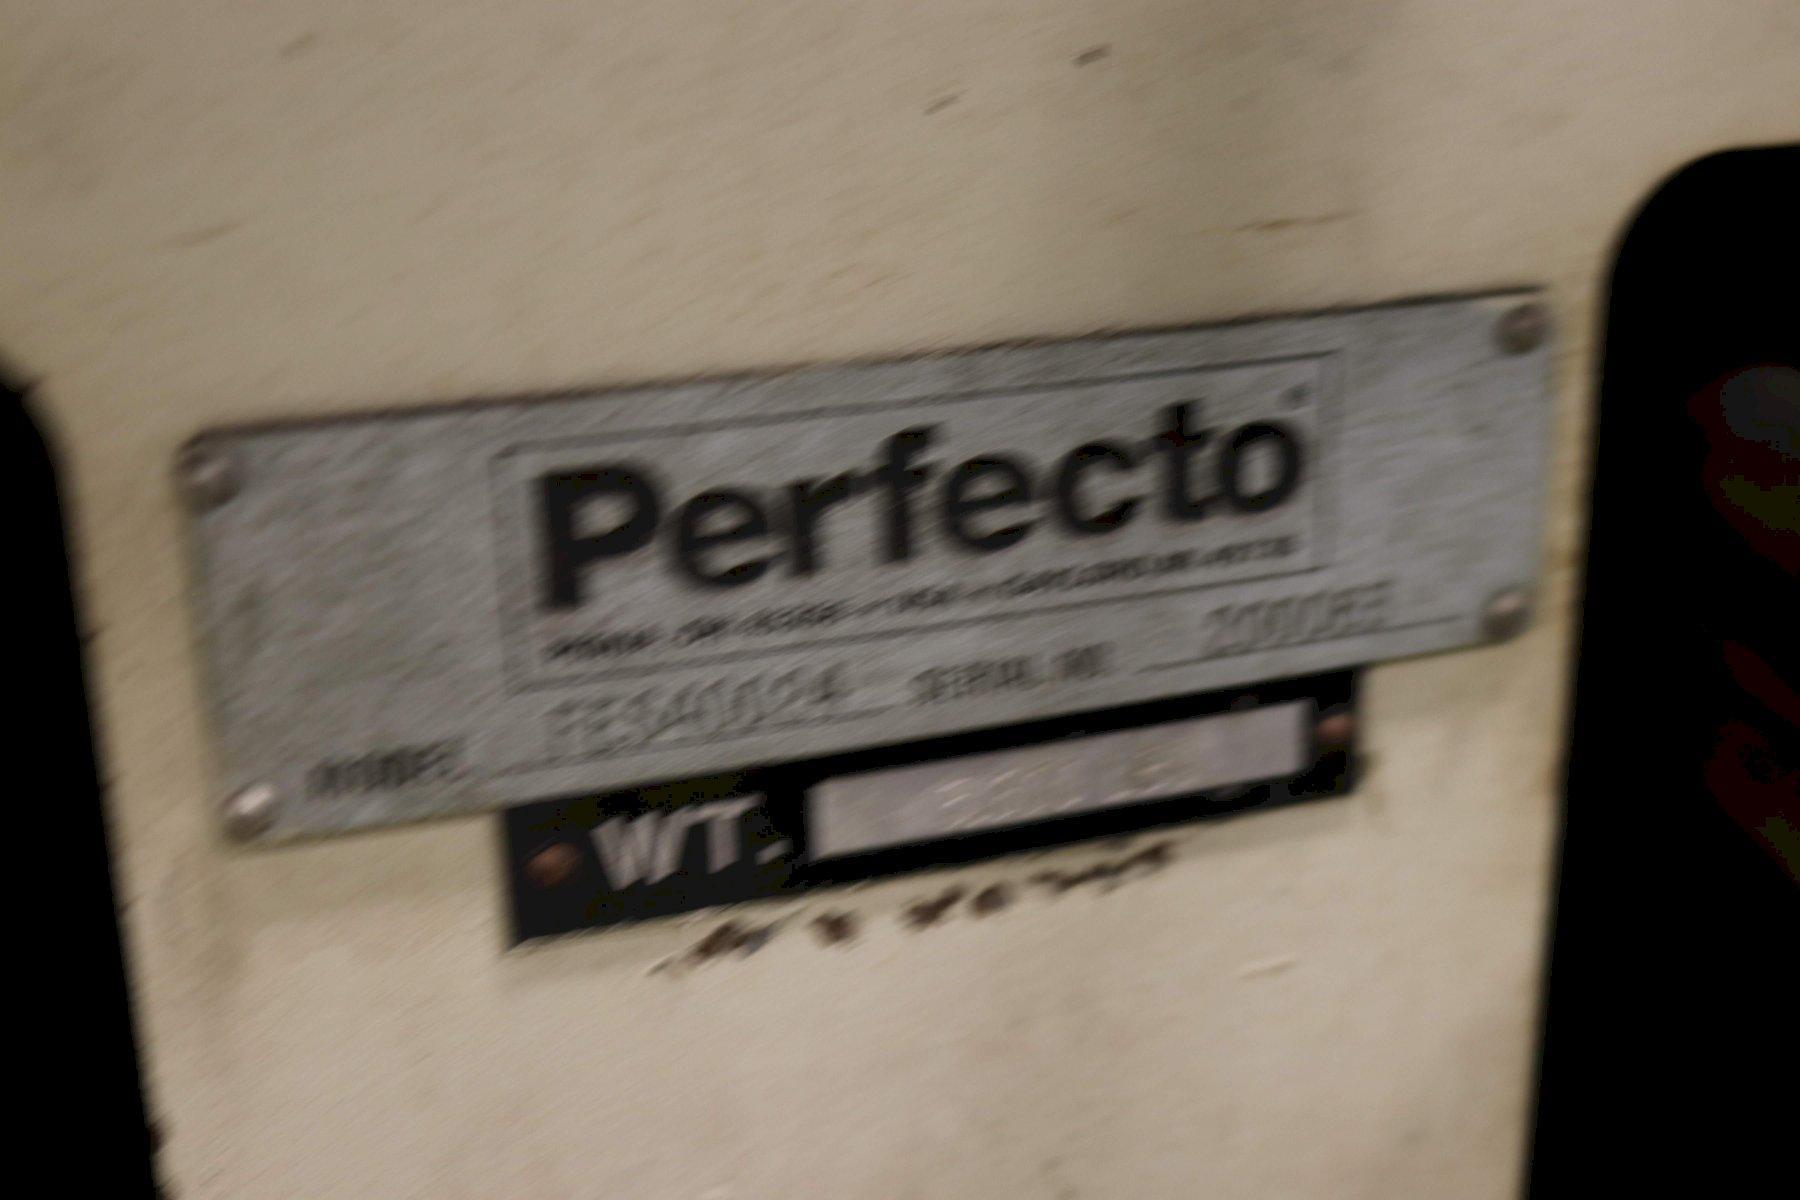 PERFECTO FEEDER: STOCK #73849